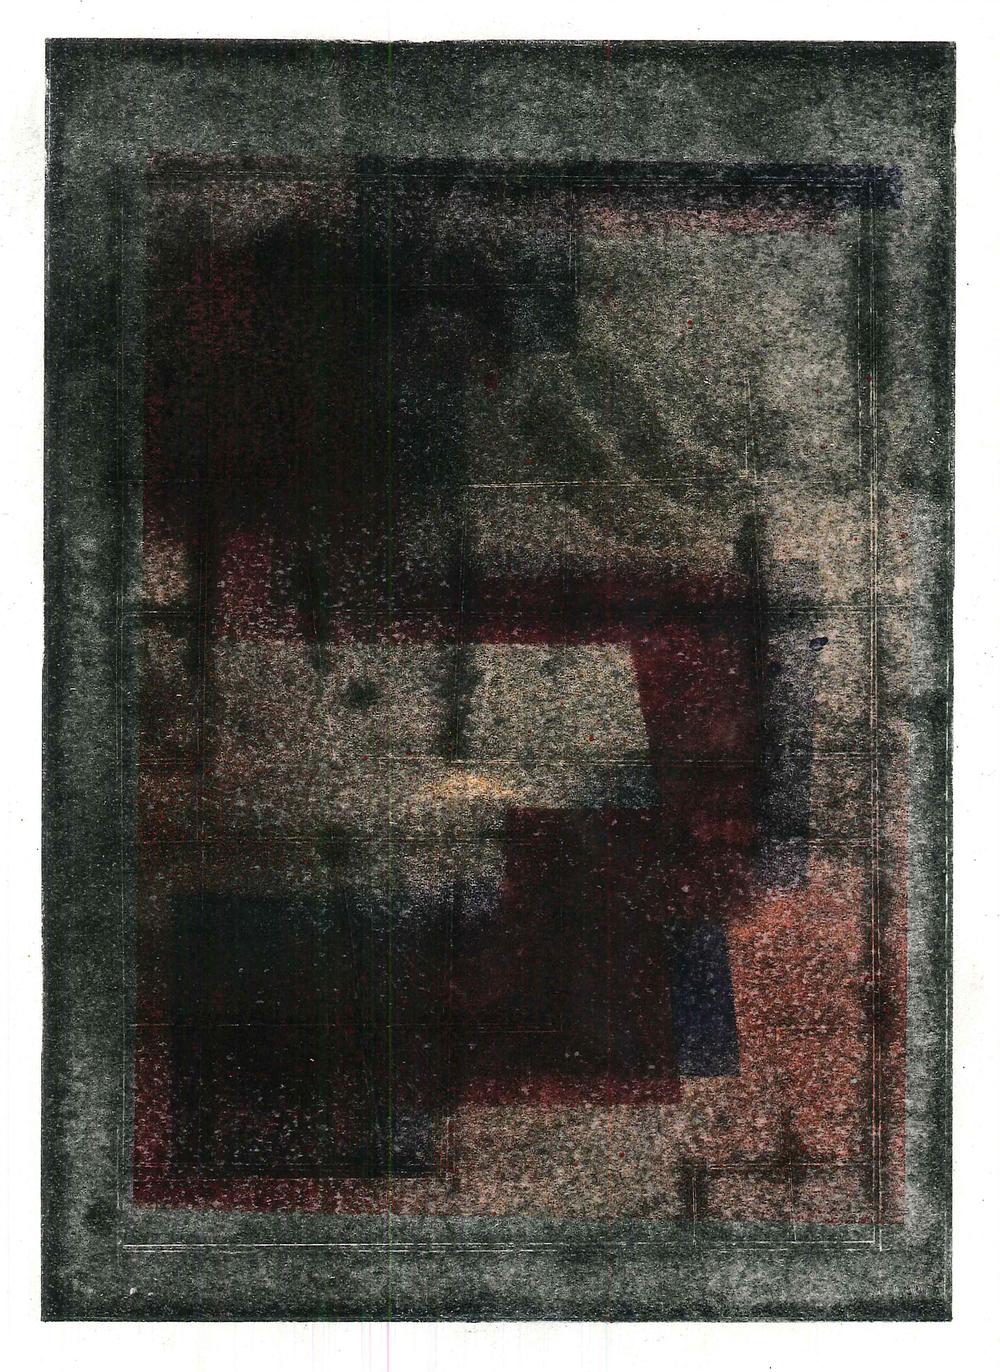 'S3', 2015, spray paint on cartridge paper, 15 x 21 cm